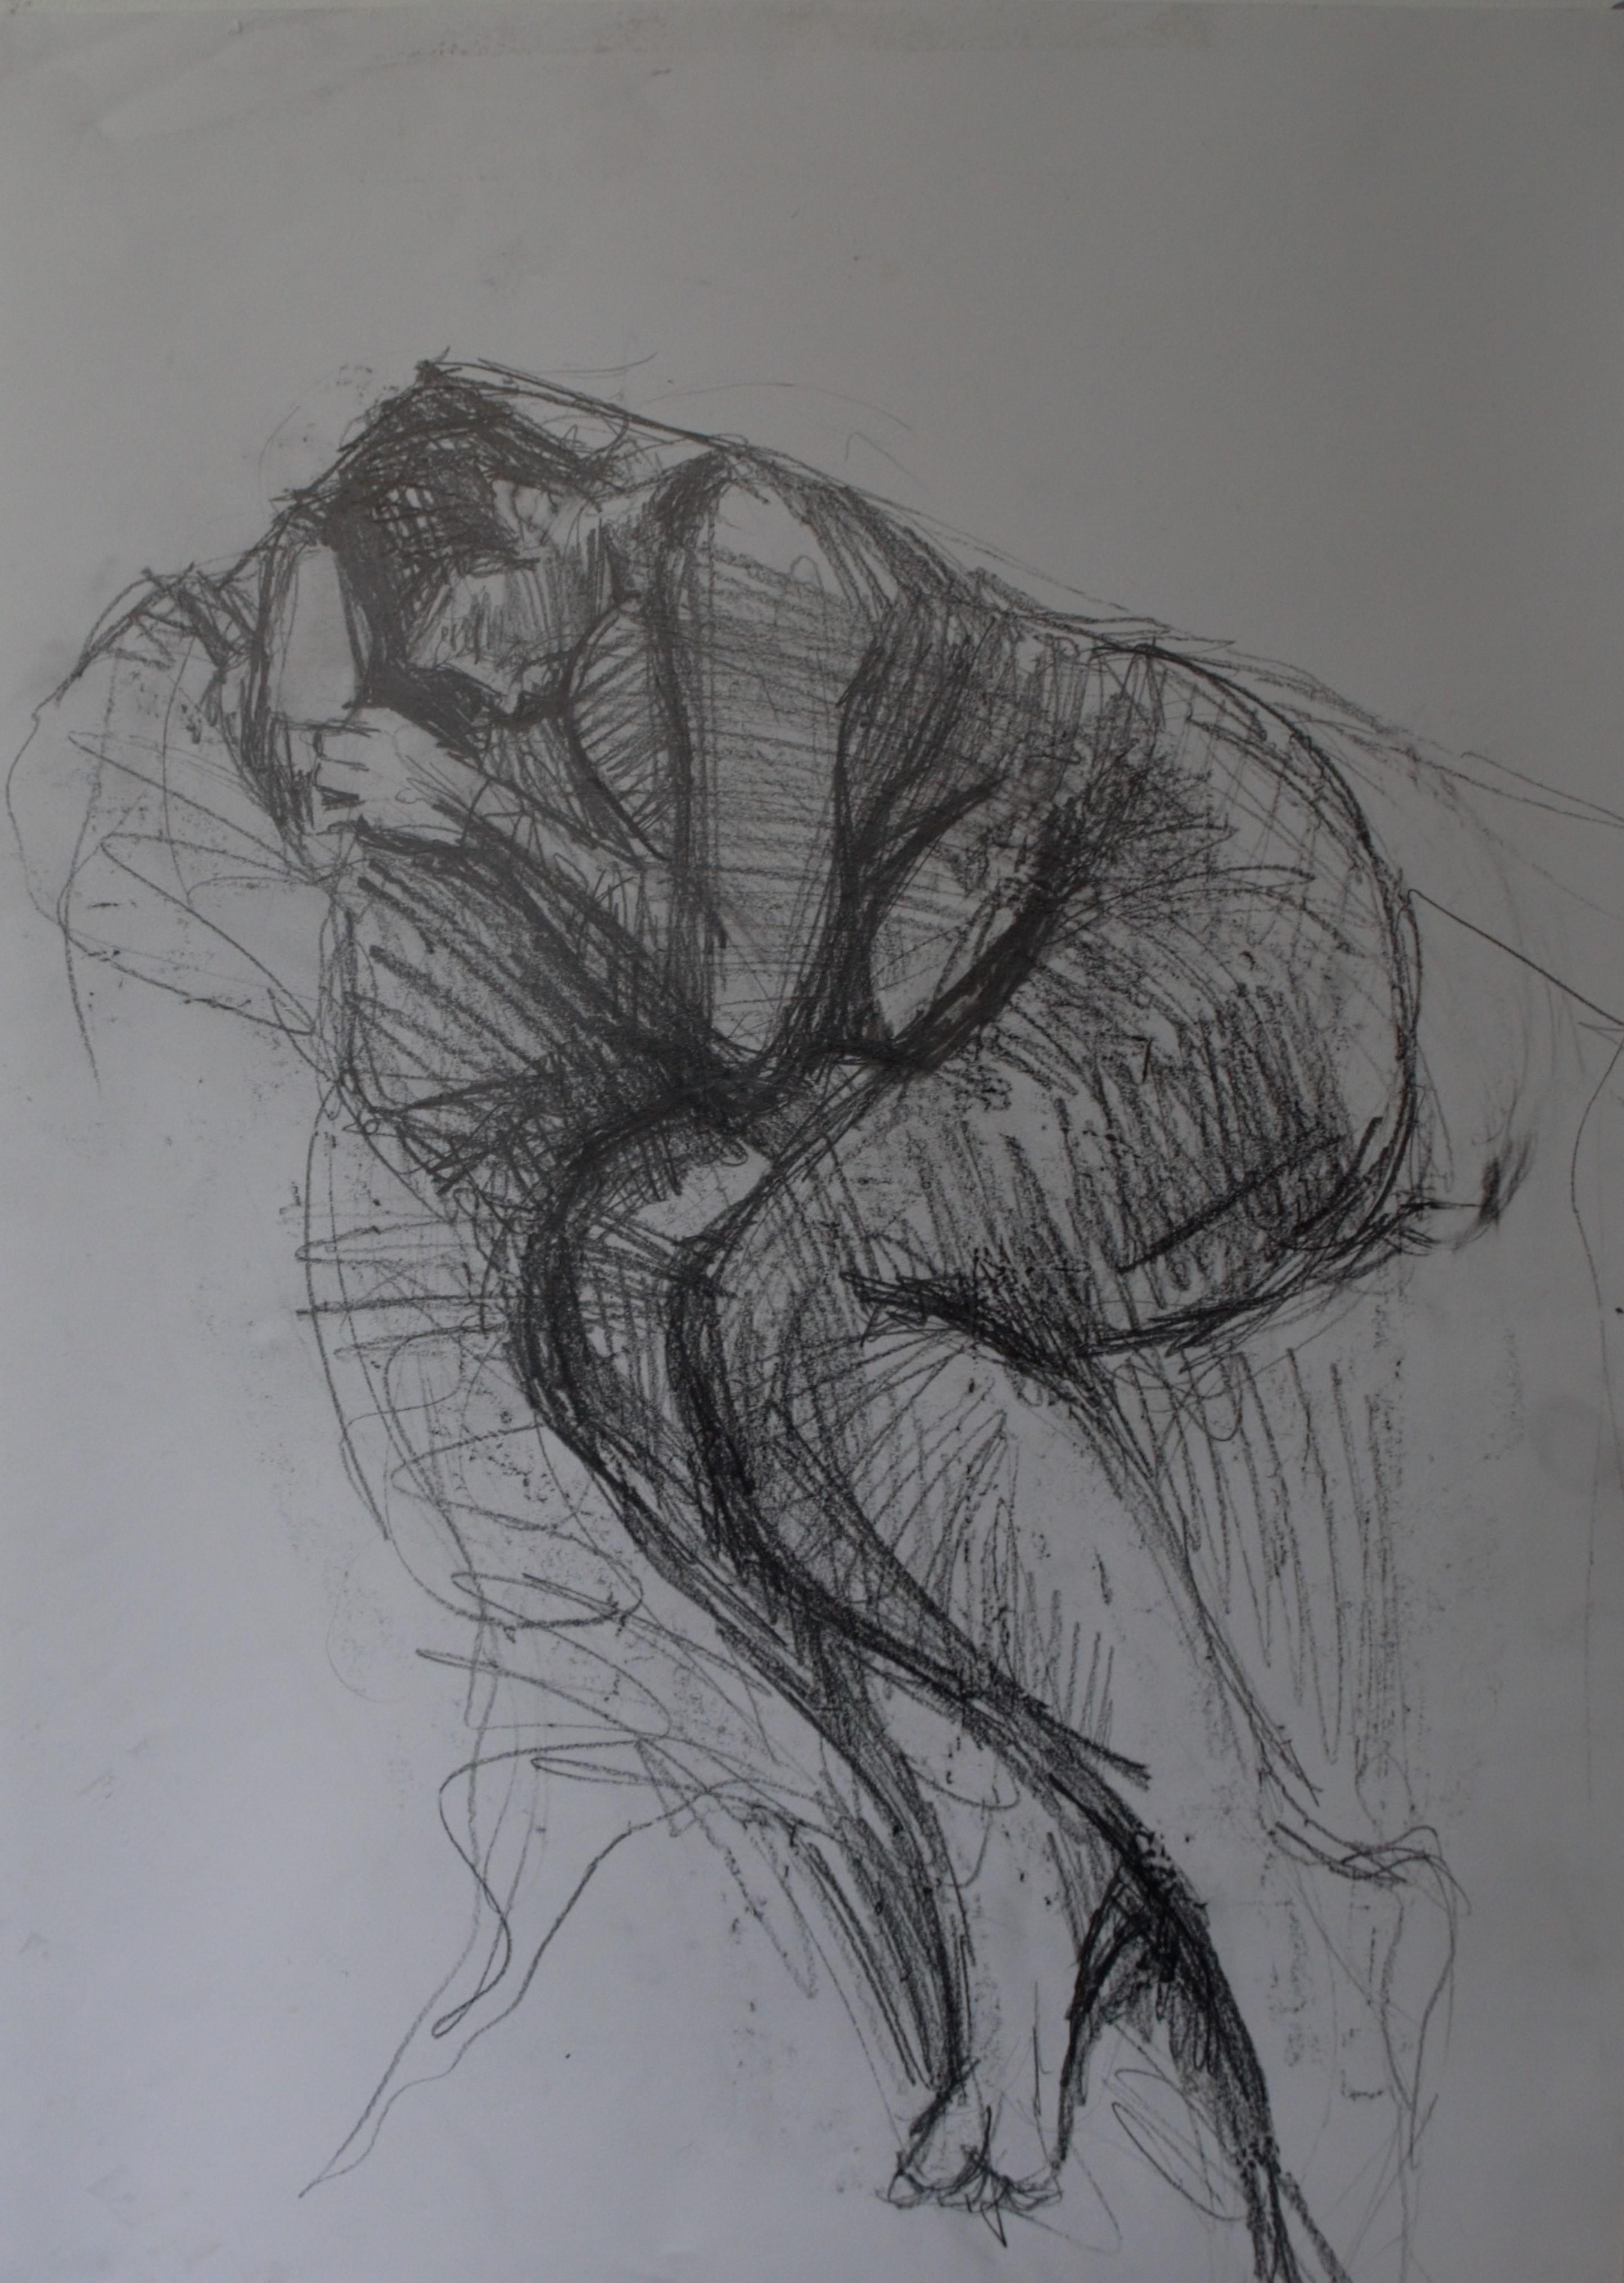 Painting drawing original art work by graham watson